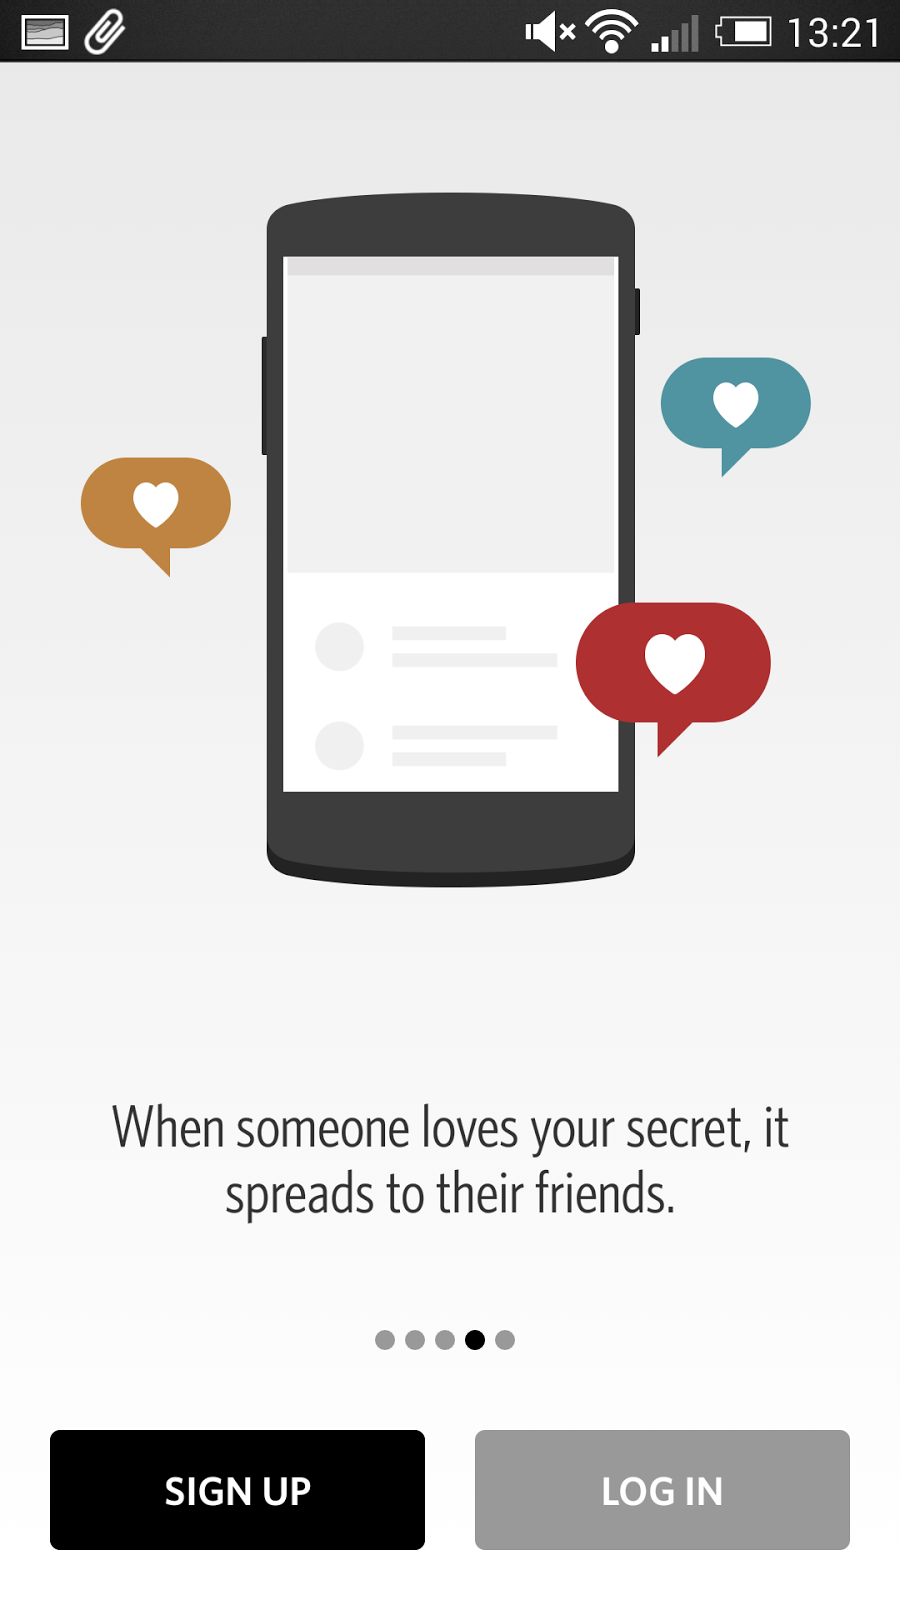 Secret 解除分享焦慮的社交 App ,對朋友匿名寫真心話 secret-03